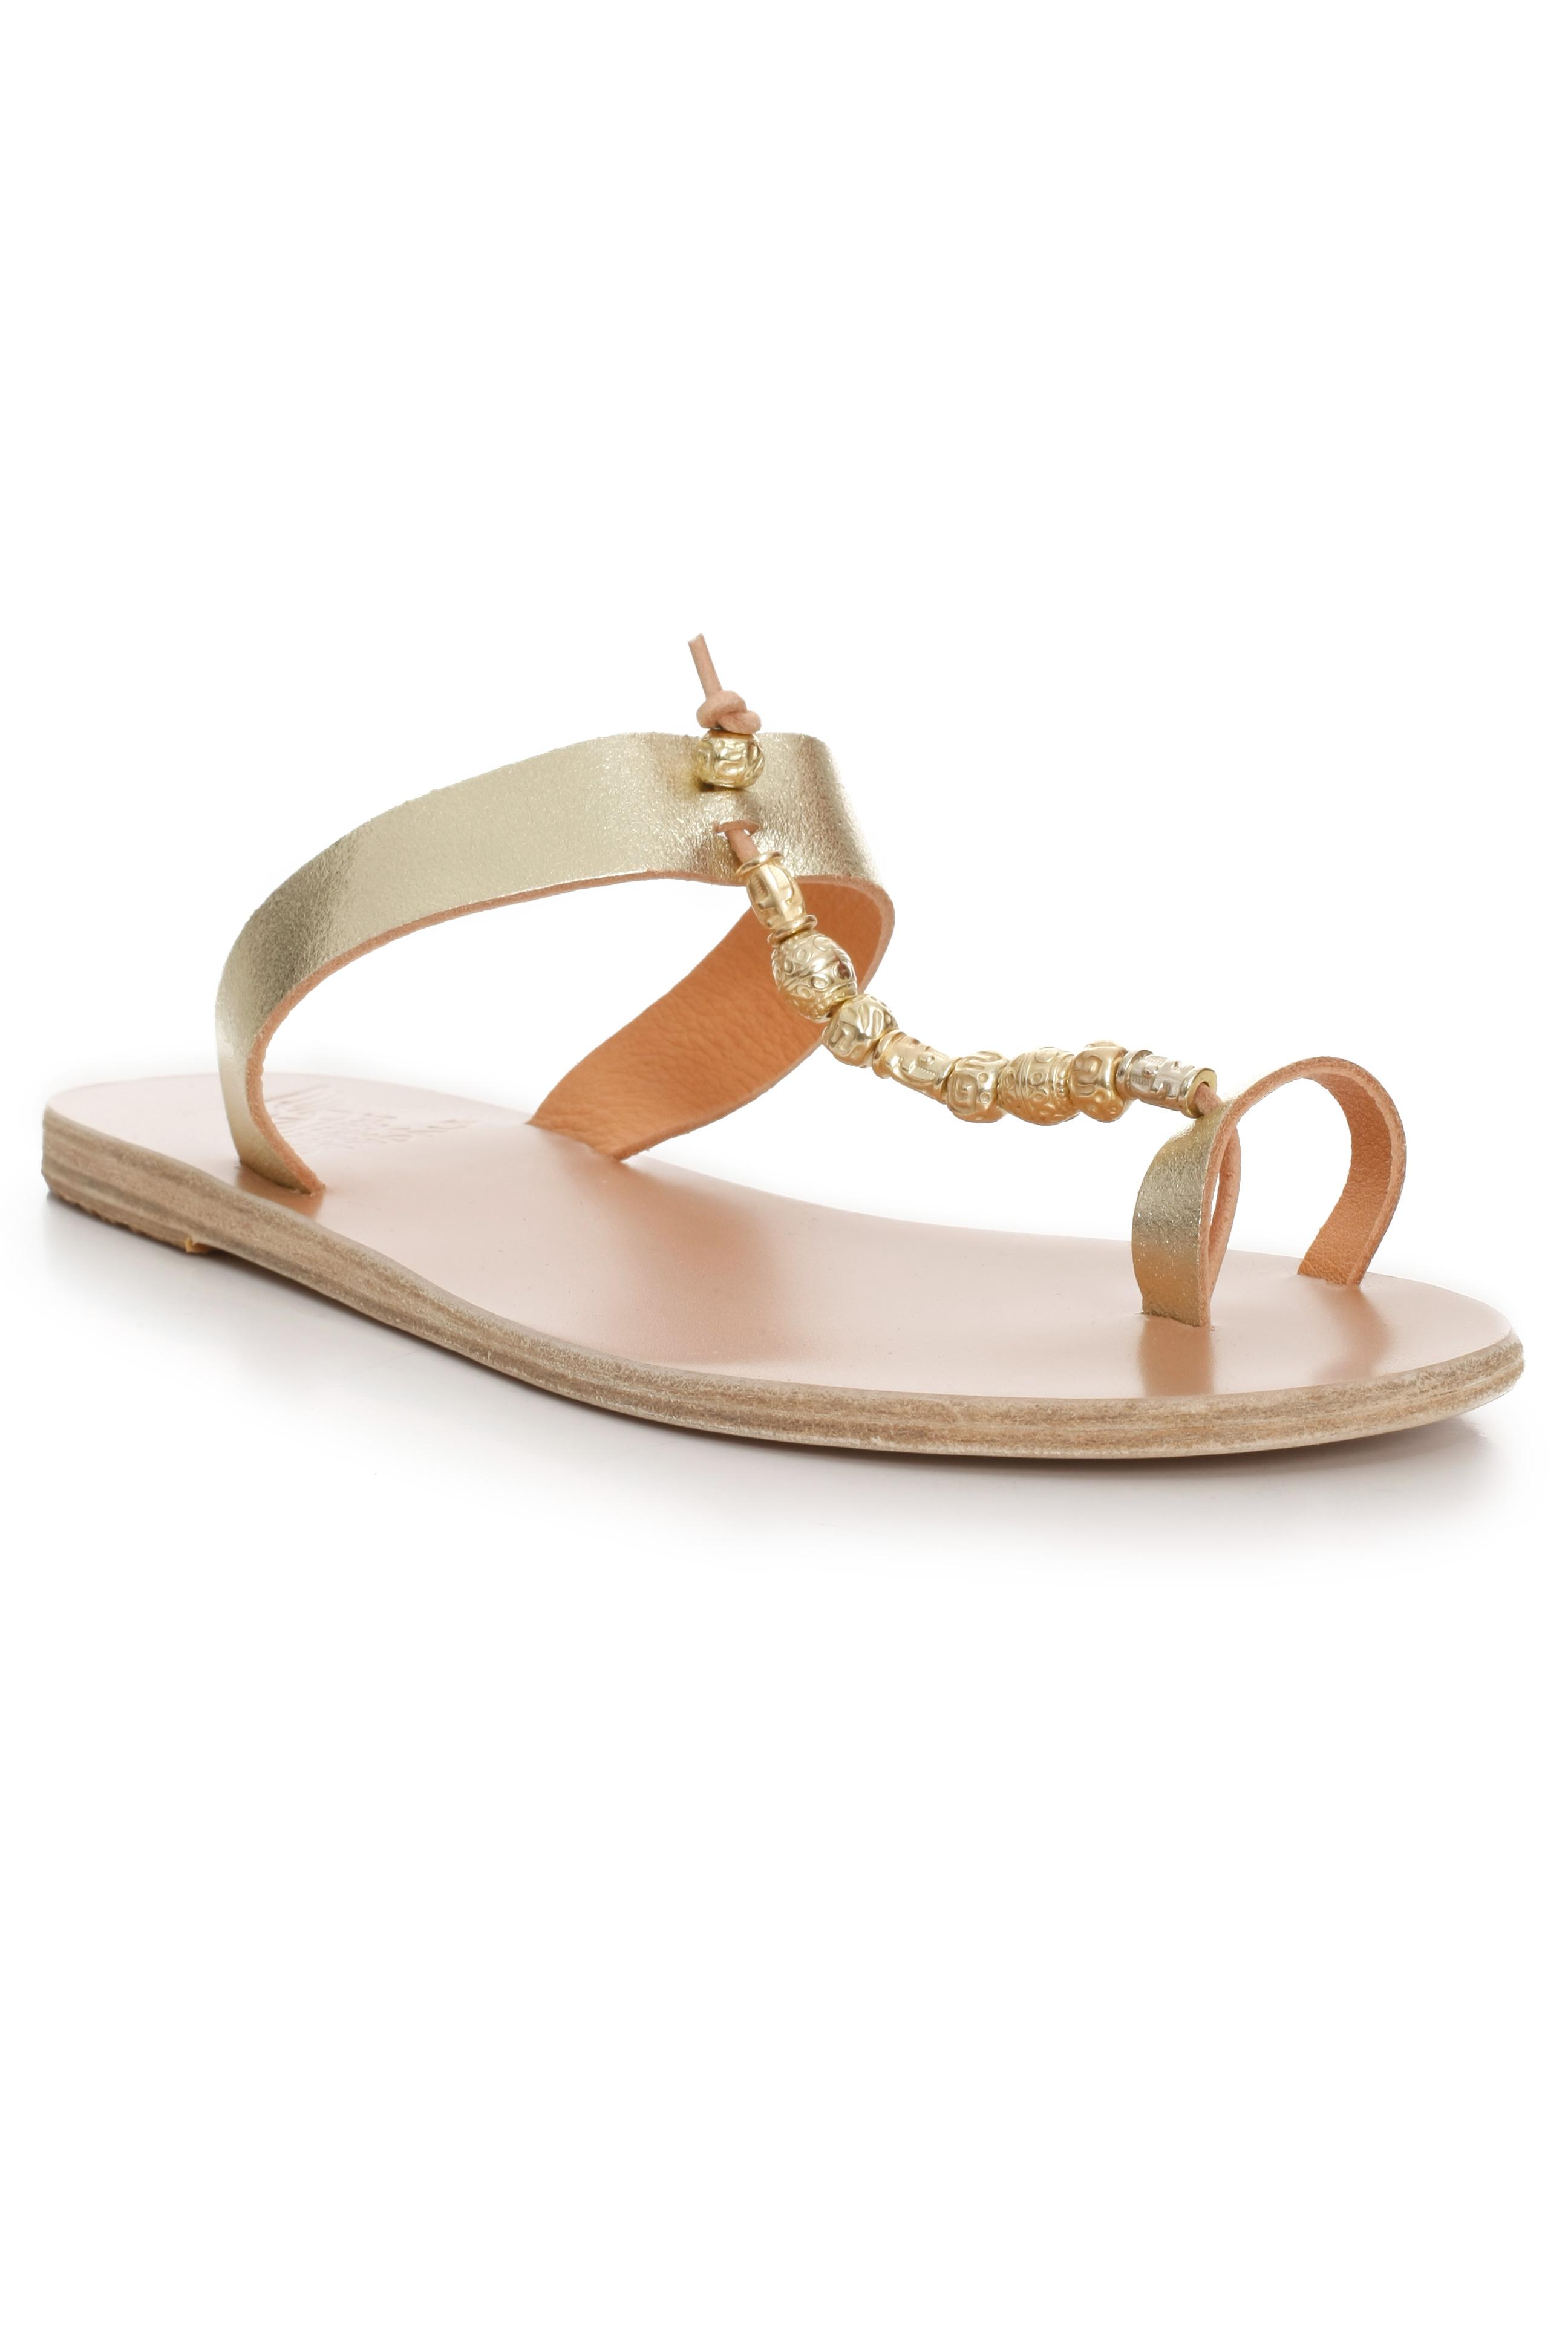 56d756071c0 Lyst - Ancient Greek Sandals Toe Loop Gold Bead Sandal in Metallic